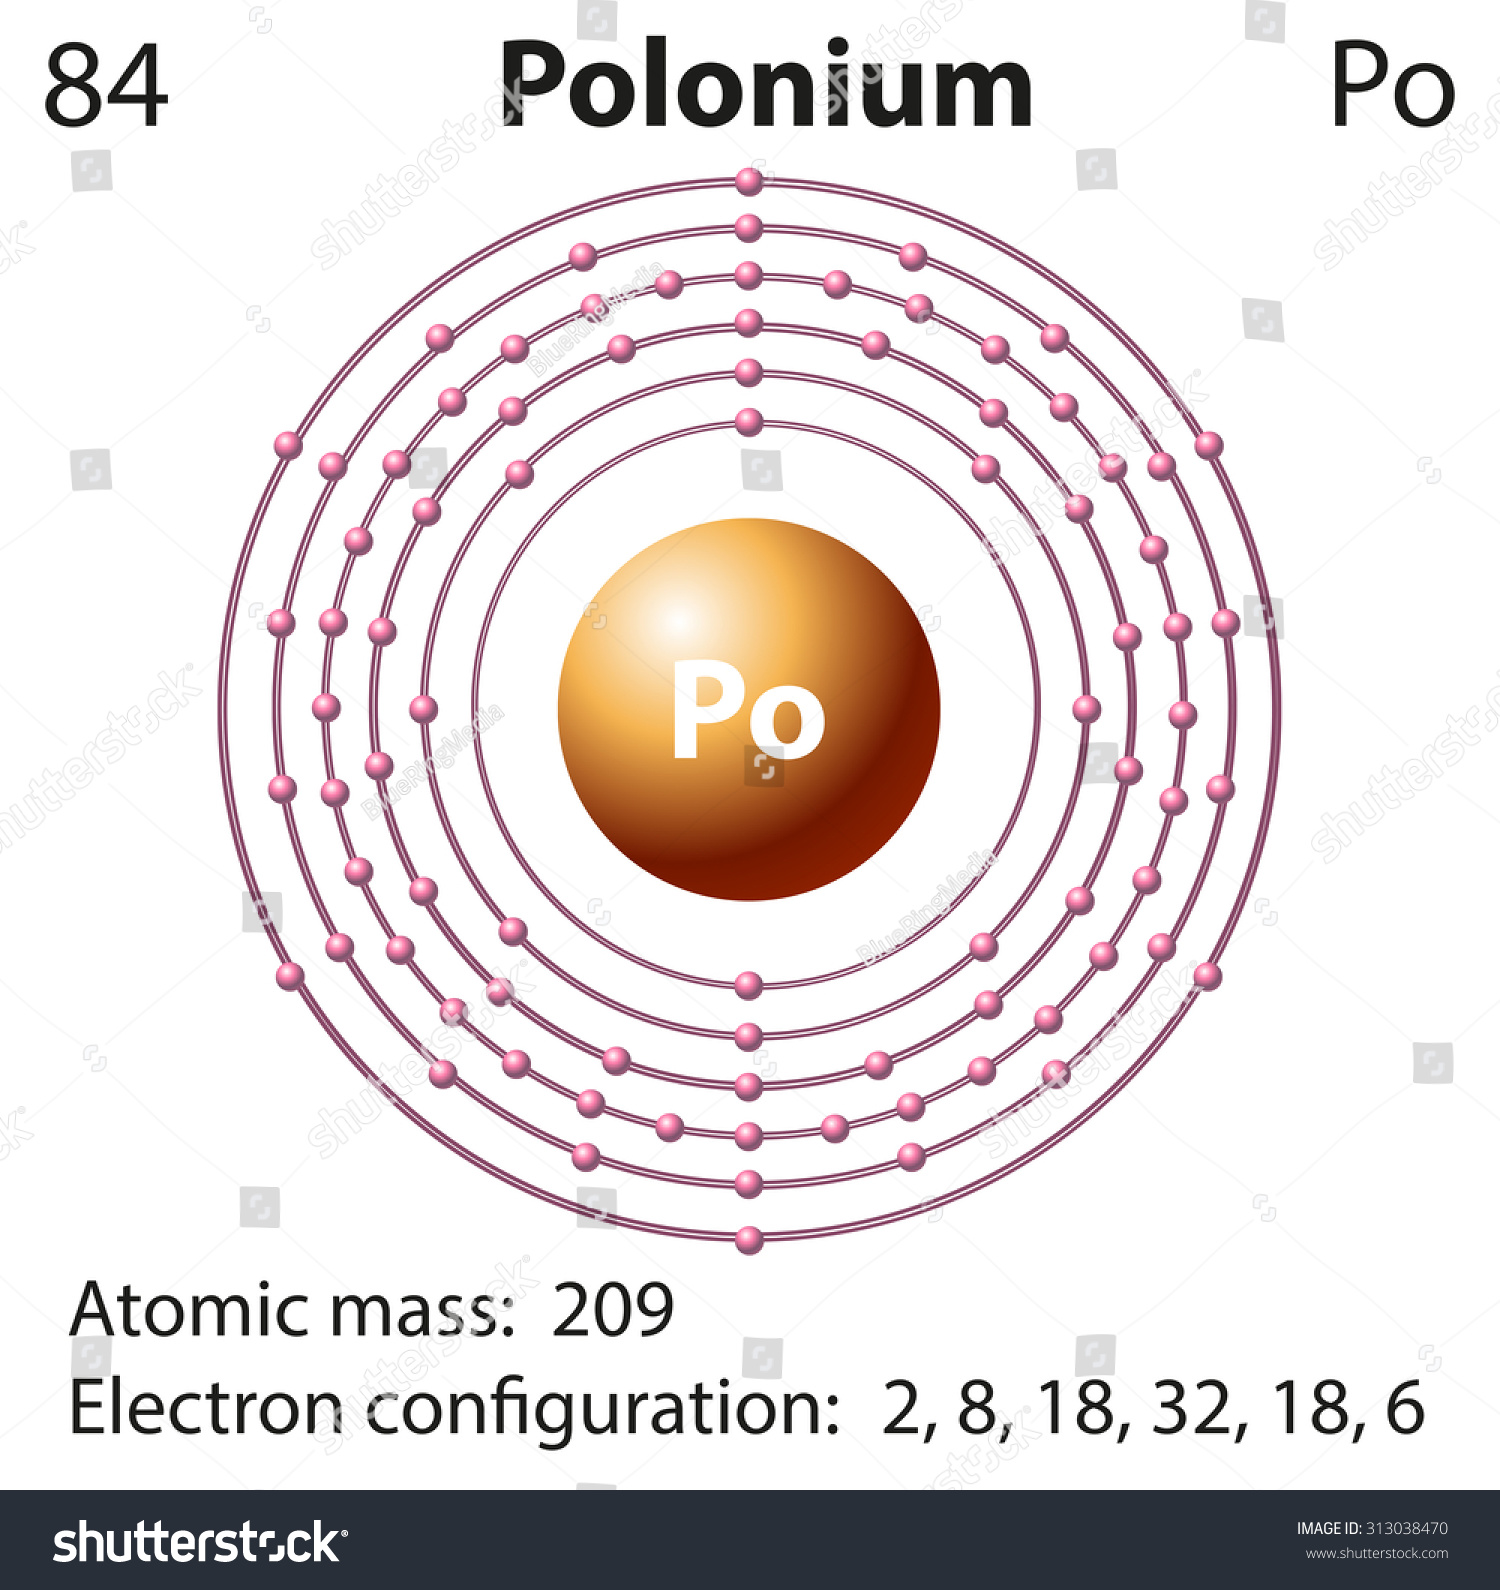 Polonium element diagram search for wiring diagrams diagram representation element polonium illustration stock vector rh shutterstock com diamond structure polonium bohr model diagram ccuart Choice Image